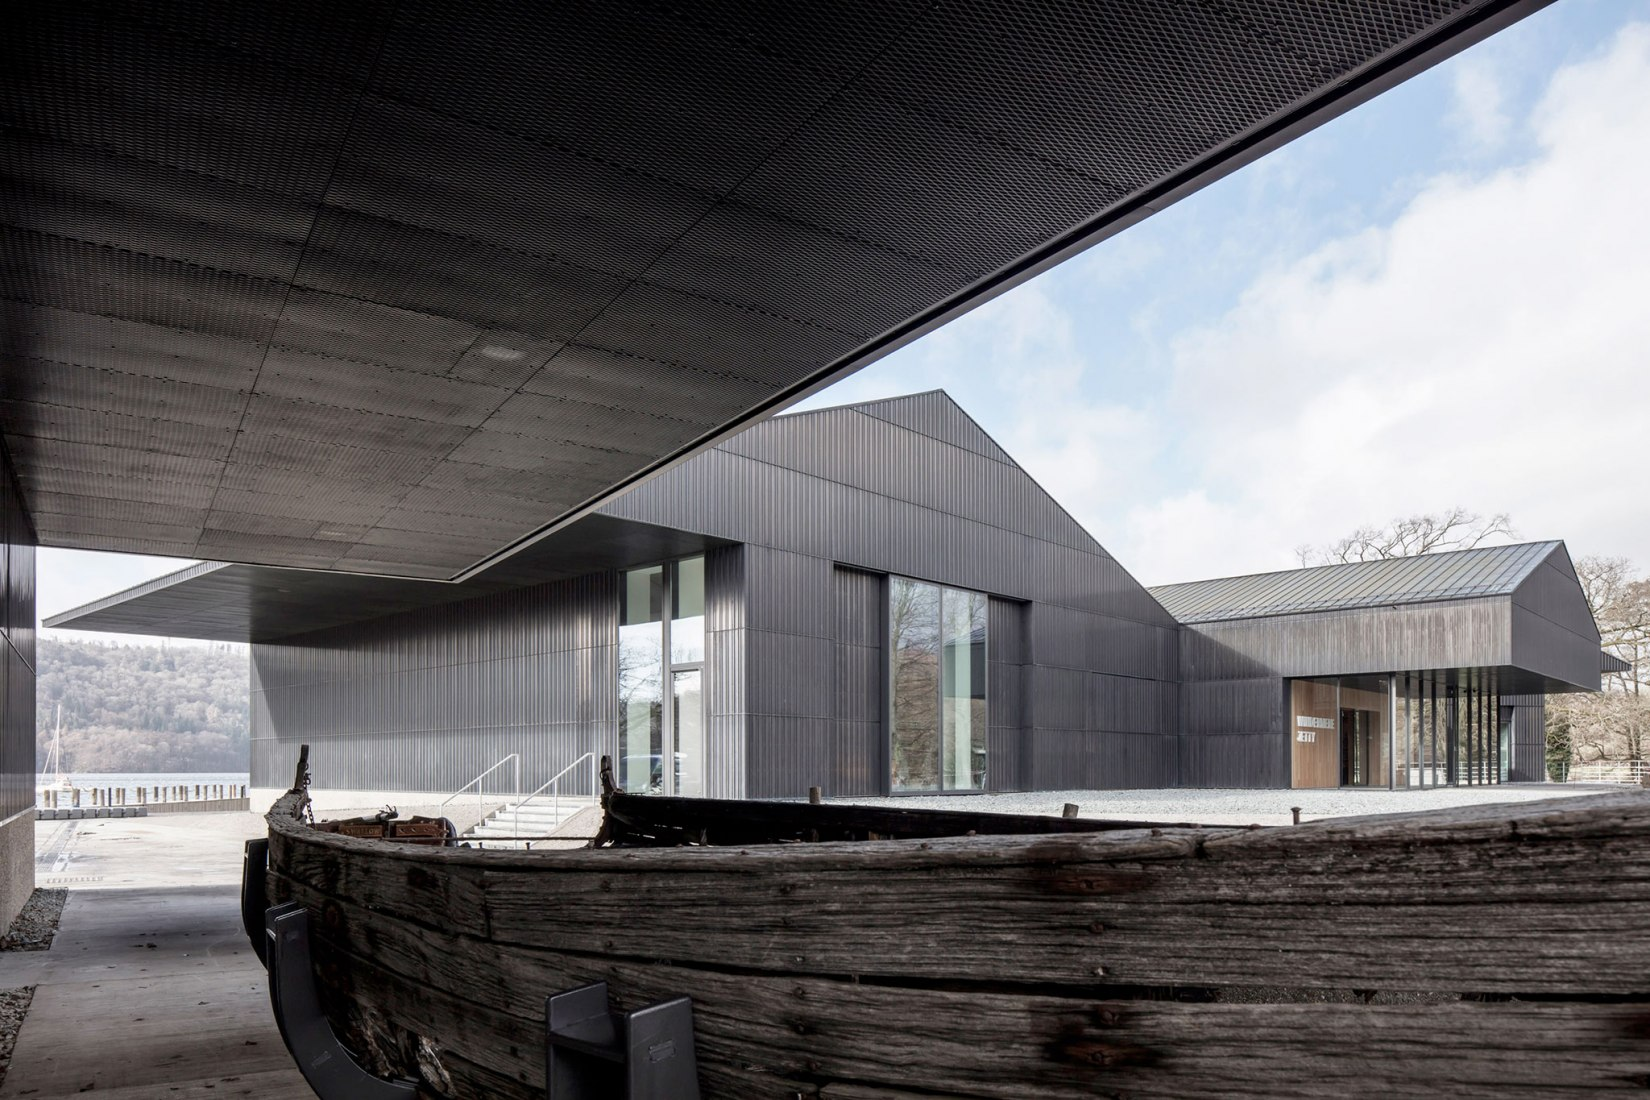 Museo de barcos Windermere Jetty por Carmody Groarke. Fotografía por Christian Richter